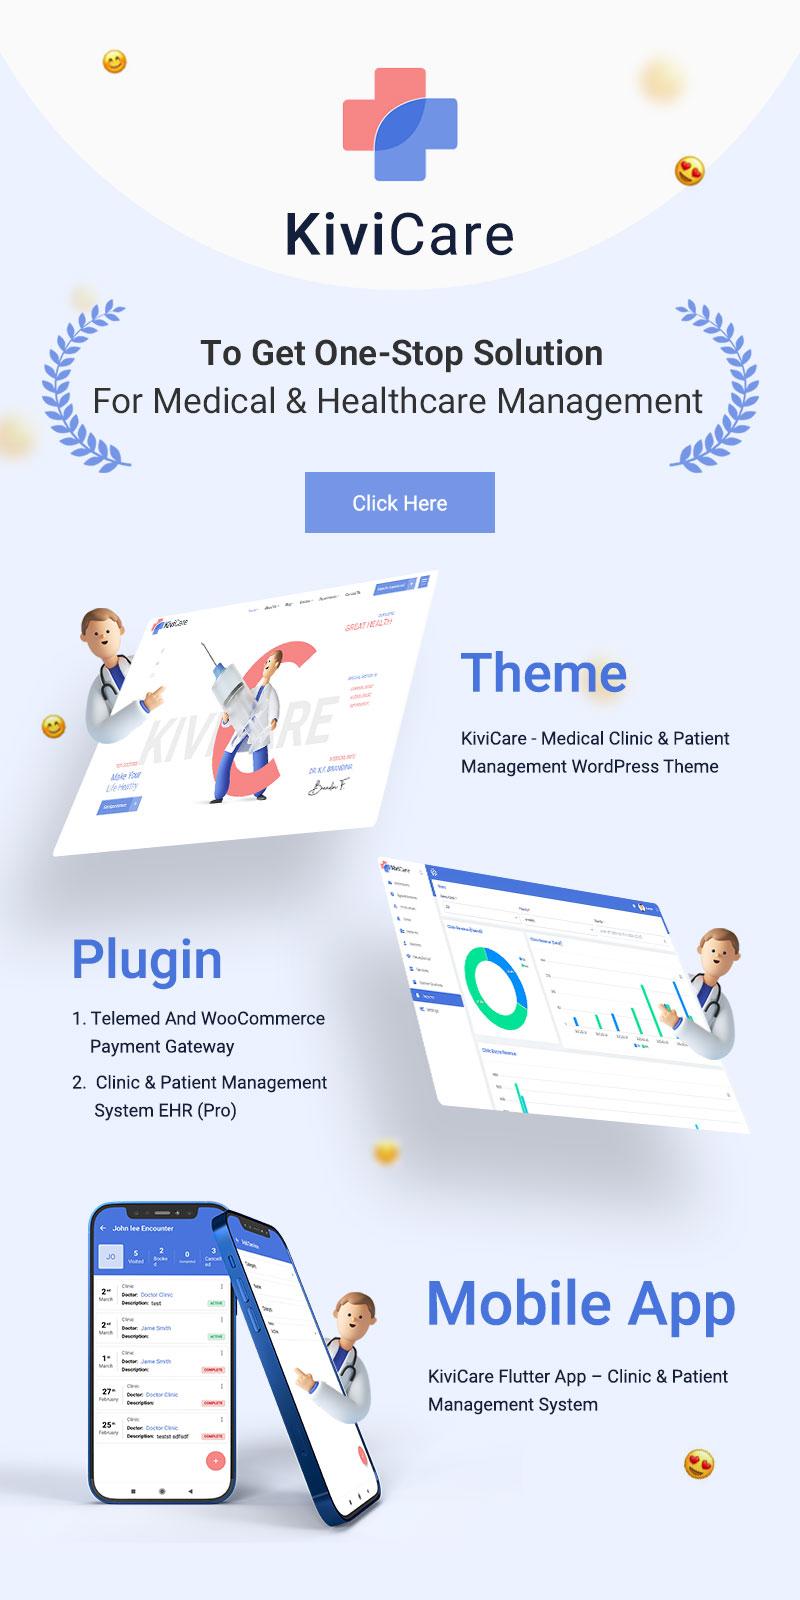 Flutter 2.0 App – Clinic and Patient Management System | KiviCare | Iqonic Design  Latest Flutter UI Kit For You To Build A Mobile App – KiviCare EcoSystem VSPMvoNbuGM86ICnG5KuUM9ZXaDfF ZrTctZZU4ysMlYJDmE5S0n3UuyVS8BmjzYyLCDAo lePLP8e8quO73IITpmxoZB4SZko LCkS166q3brT7jmmcf6xGoY0fViVzv4SCNoIg